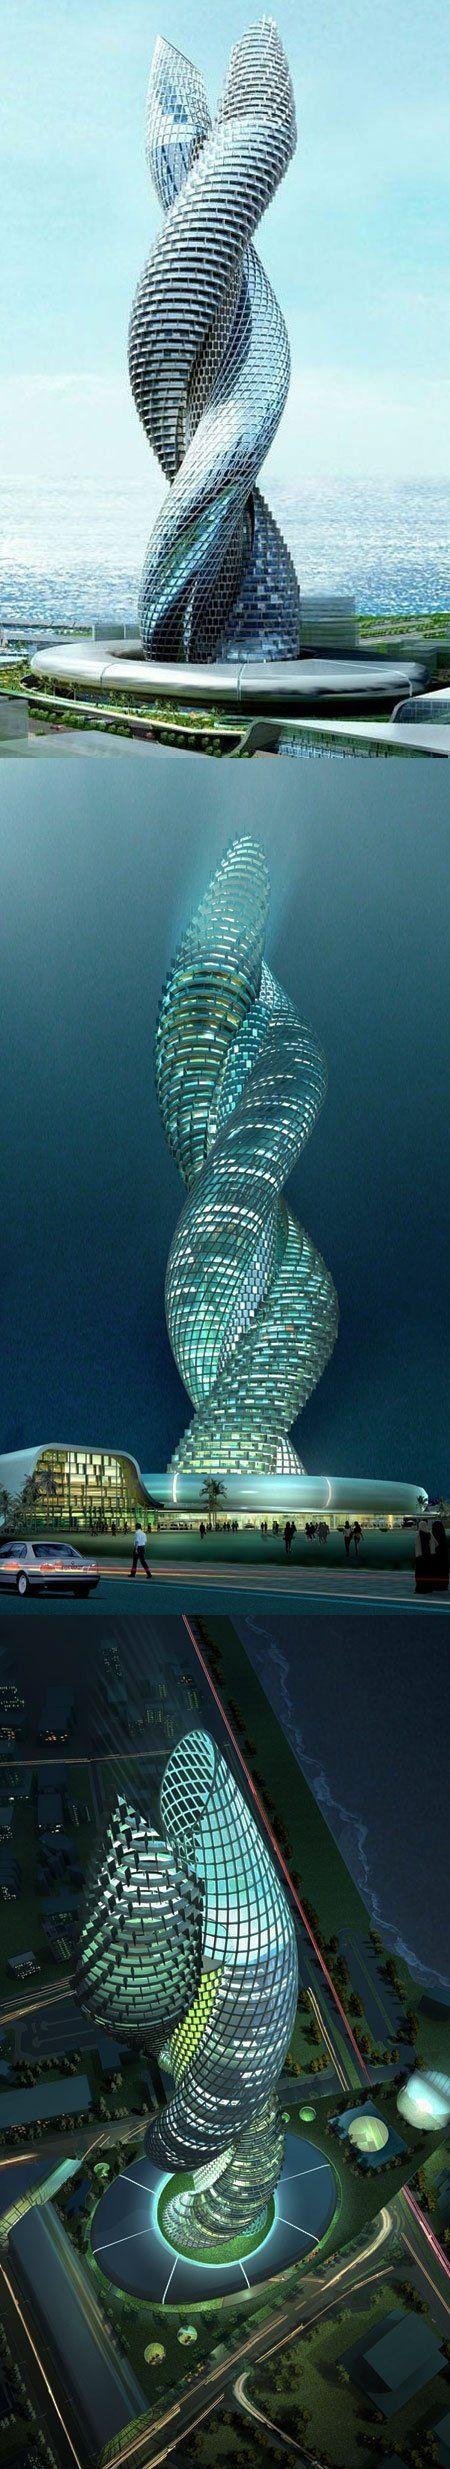 Crazy design! #myescapecompetition